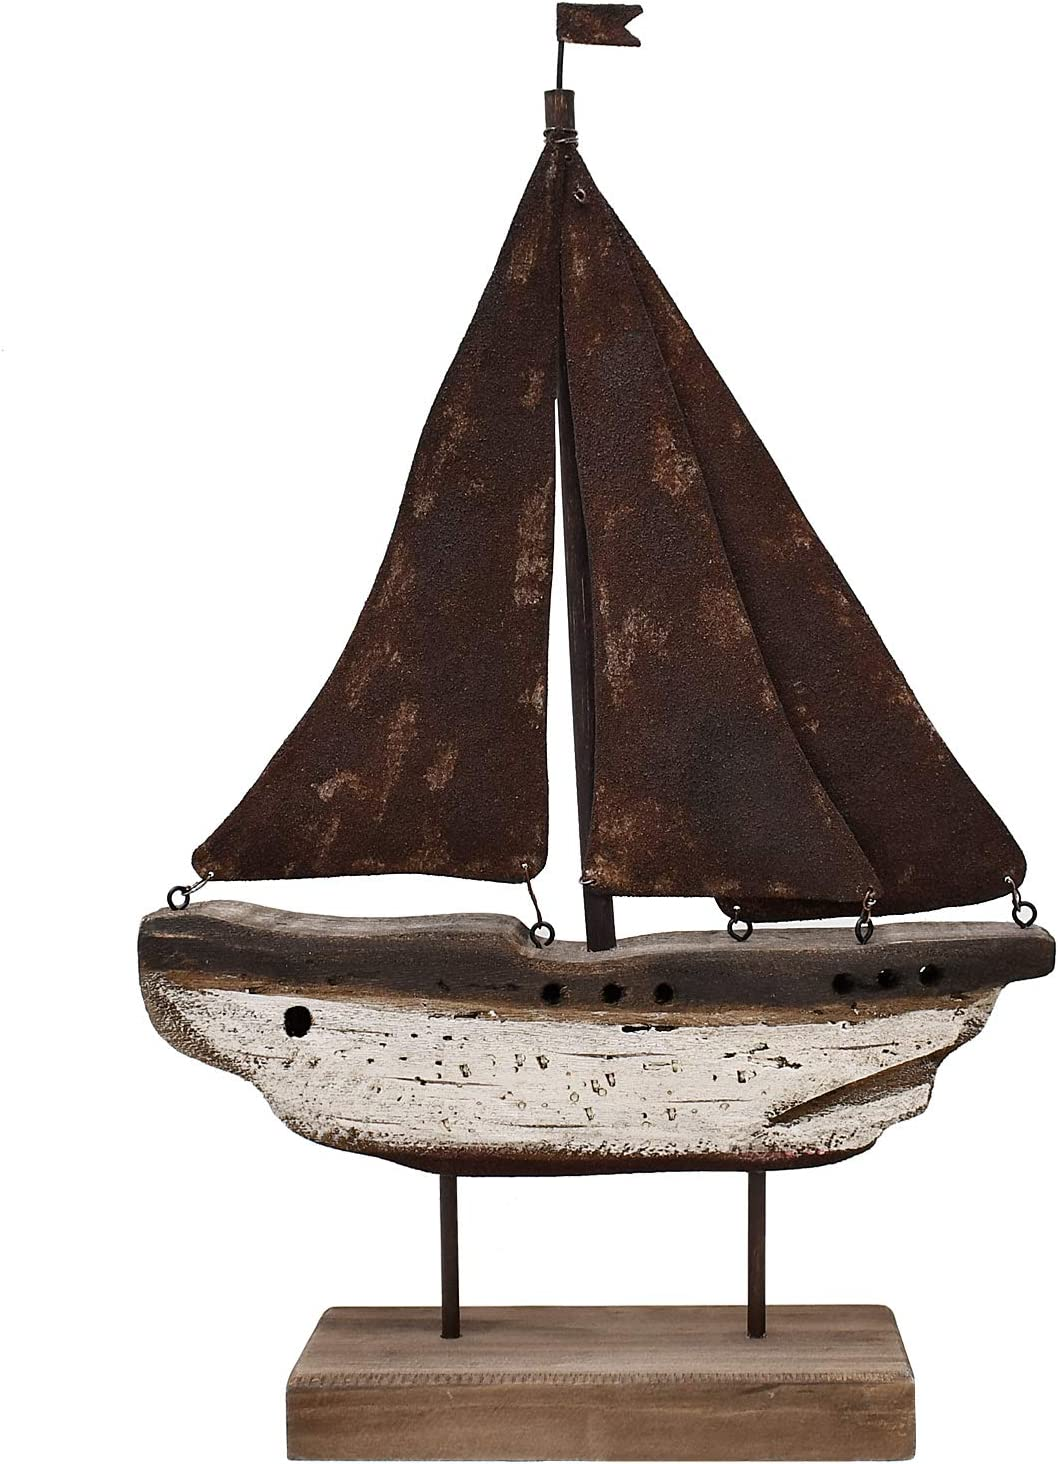 Nautical Wood Sailboat Tabletop Ornaments Handmade Rustic Wooden Boat Decoration Decorative Sailing Boat Model Beach Theme Home Decor (15